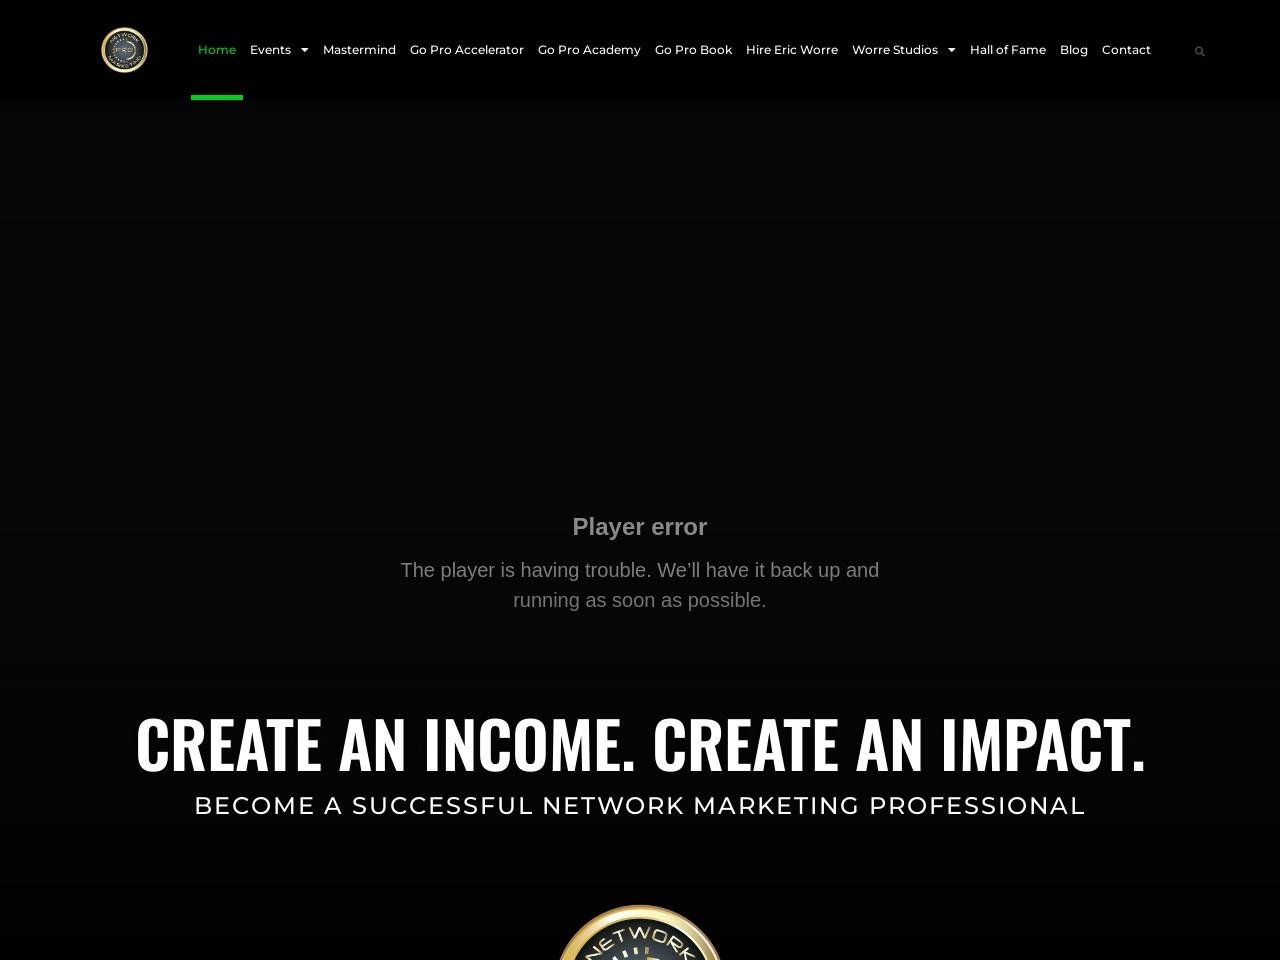 Networking Legend Harvey Mackay – Network Marketing Pro